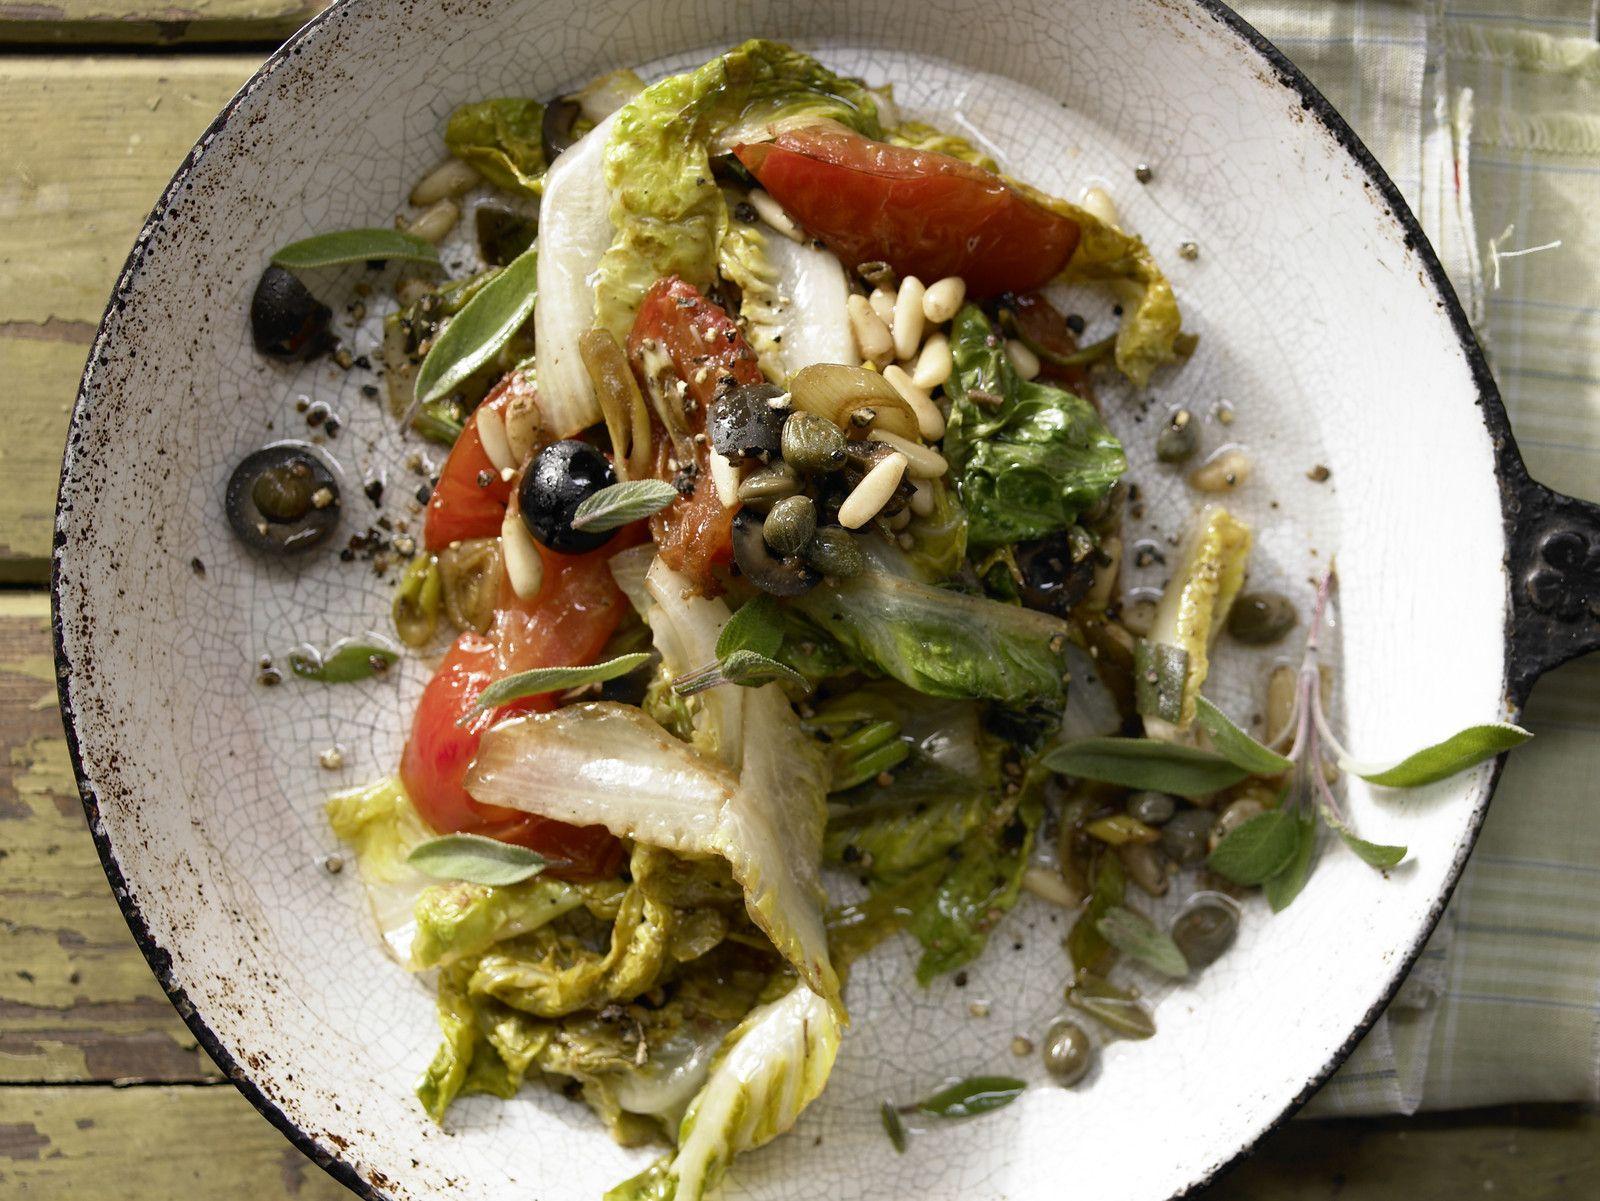 geschmorter r mersalat rezept low carb abendessen pinterest schmoren oliven und tomaten. Black Bedroom Furniture Sets. Home Design Ideas